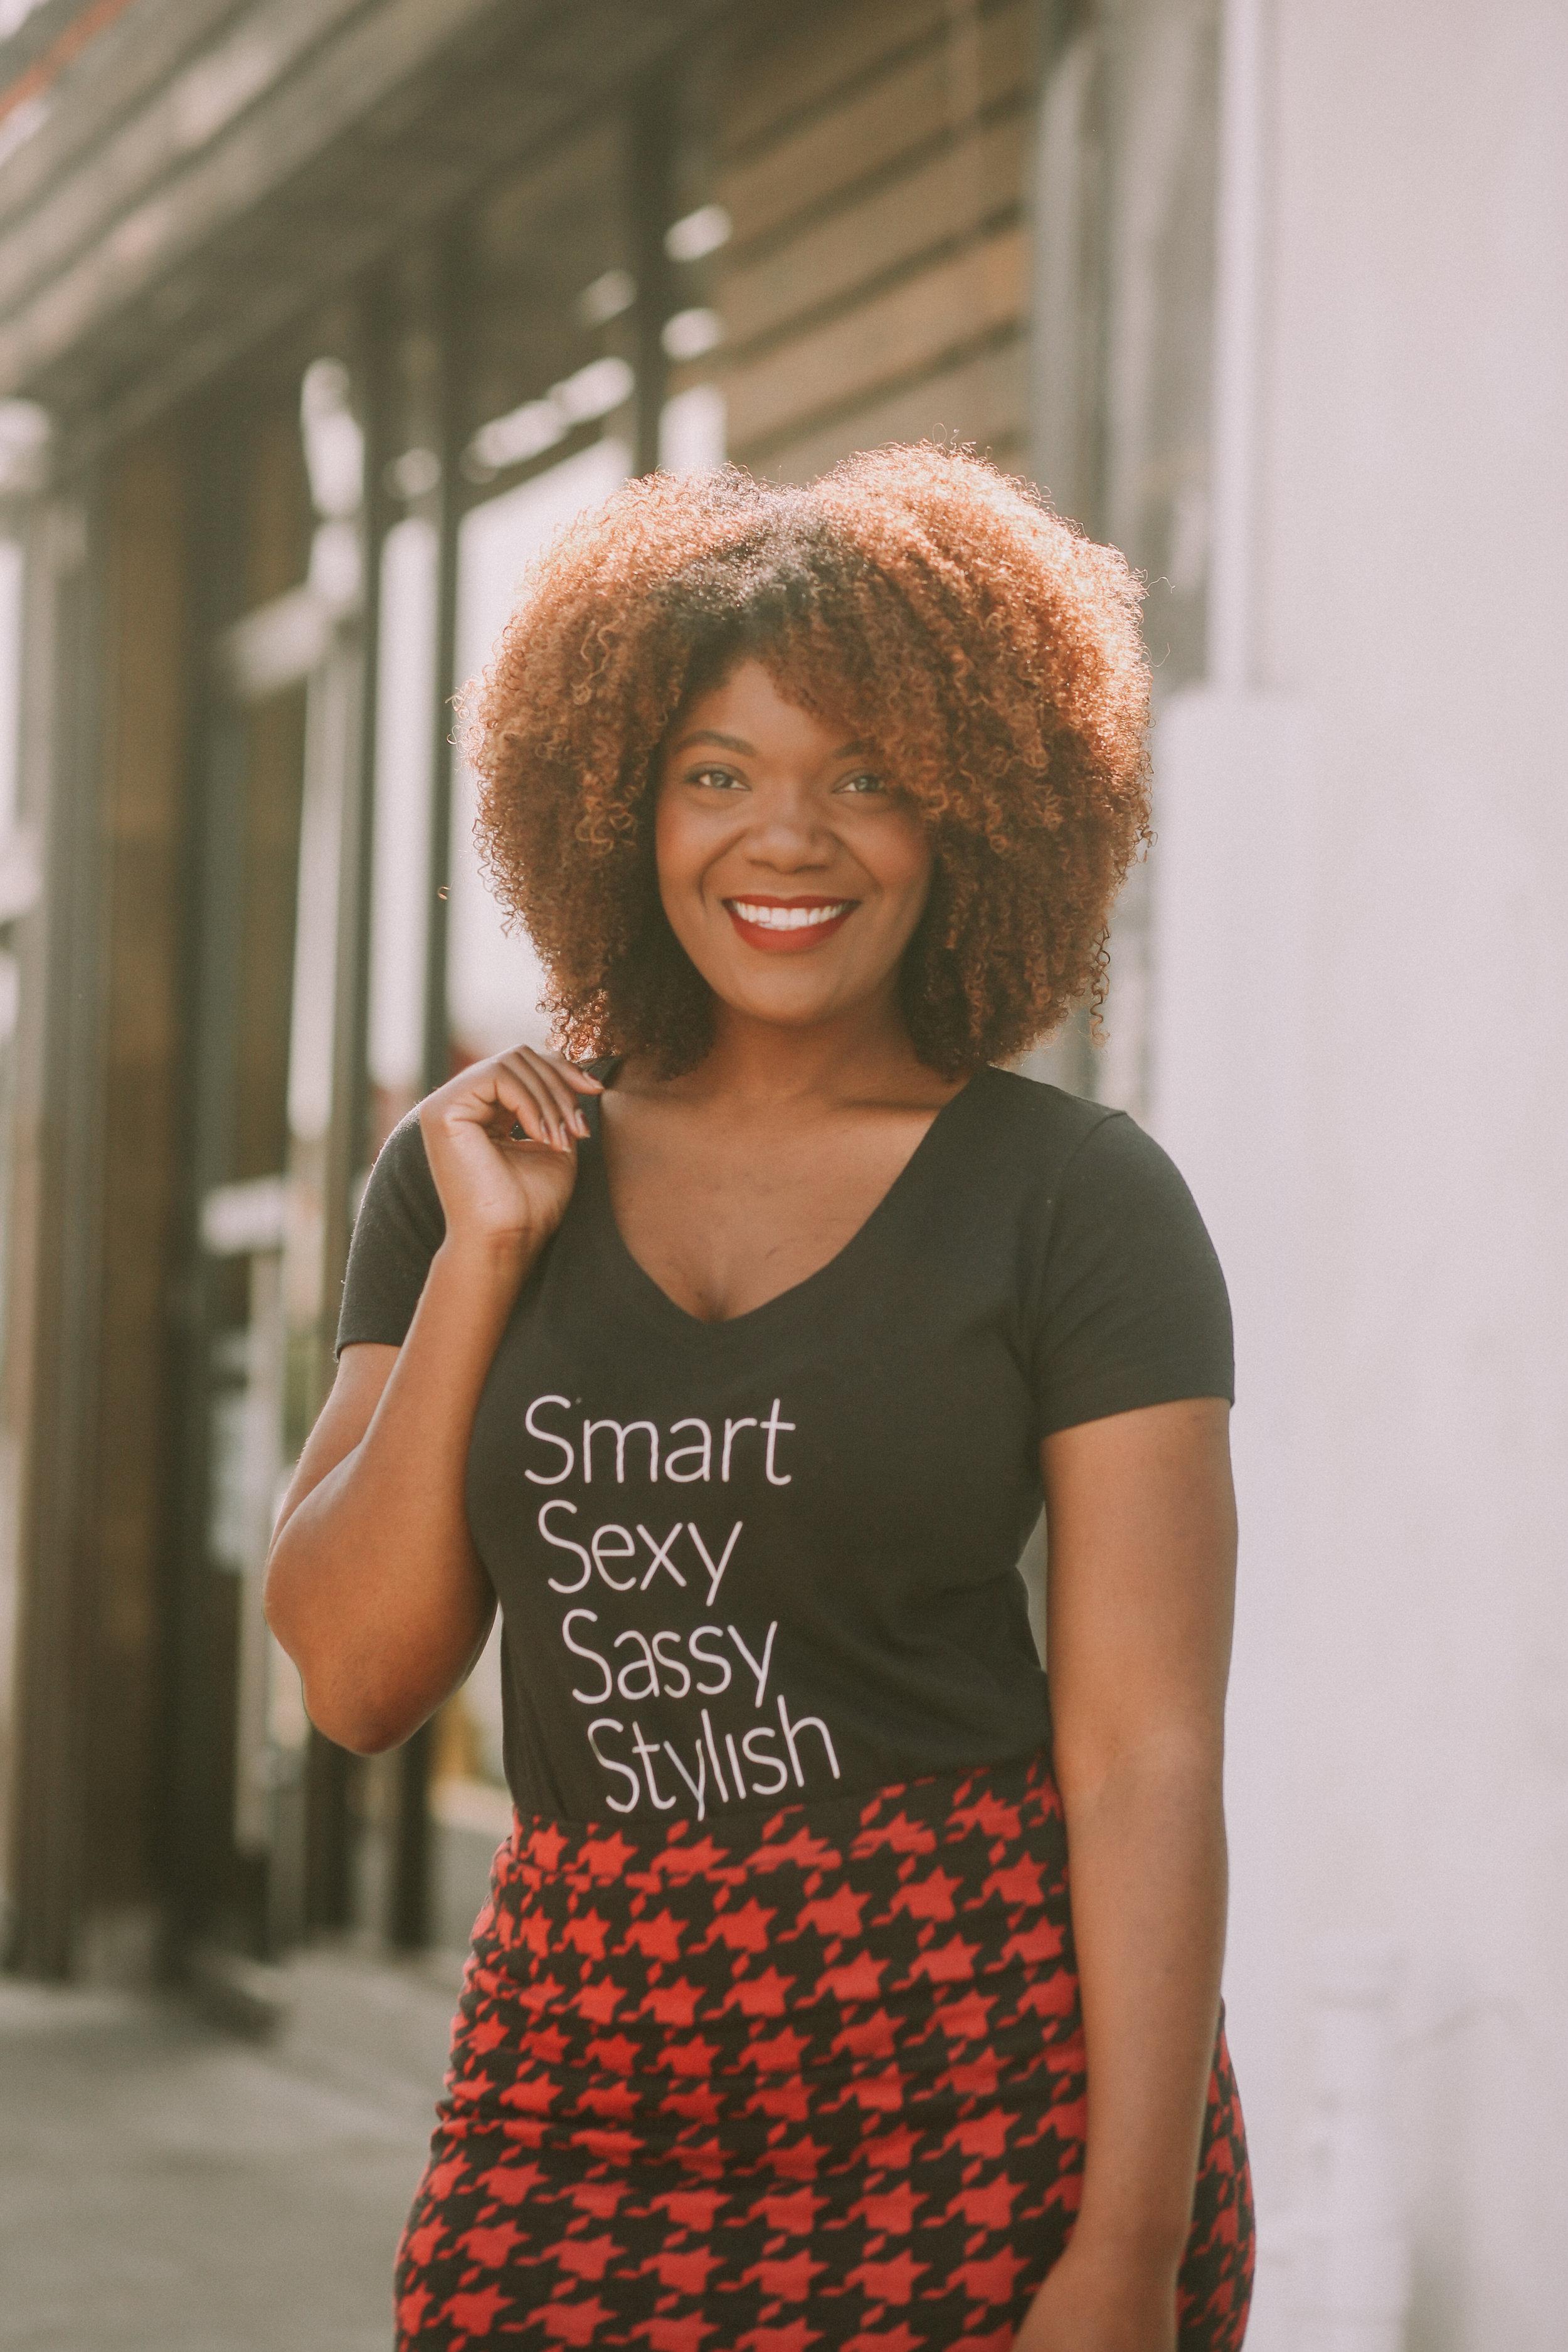 Smart, Sexy, Sassy, Stylish Slogan Tee by Arteresa Lynn